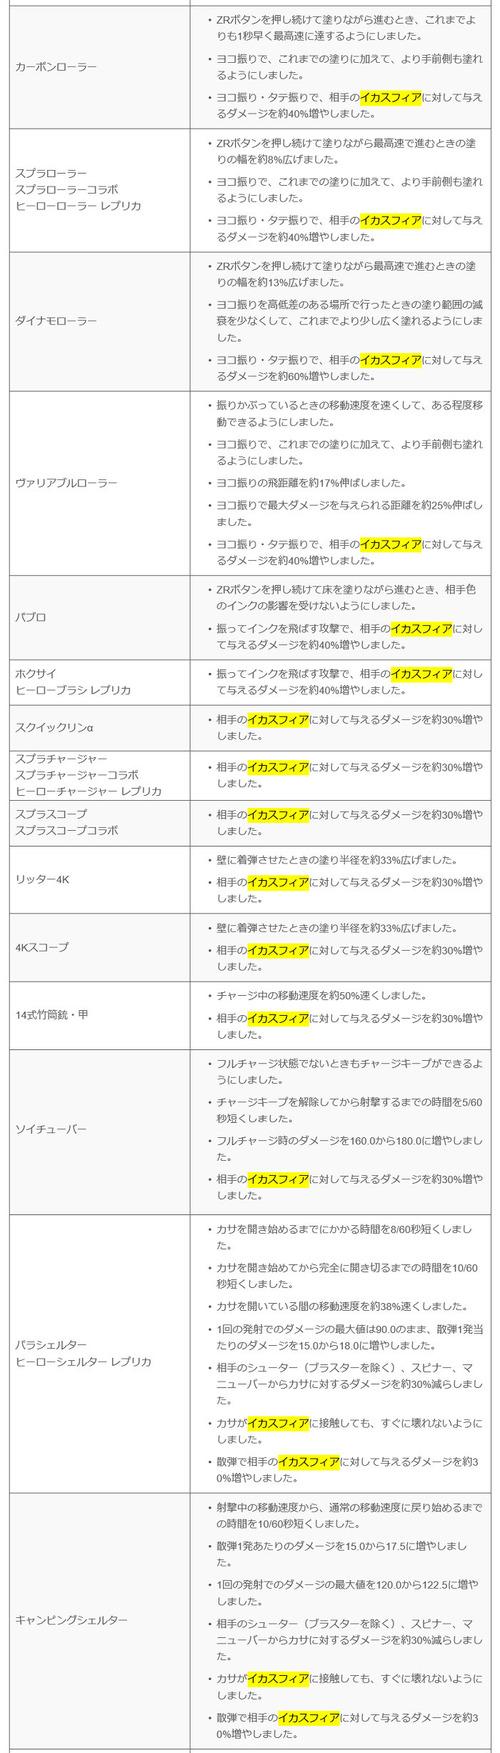 splatoon2-ikasufia-jyakutai-26kai-6